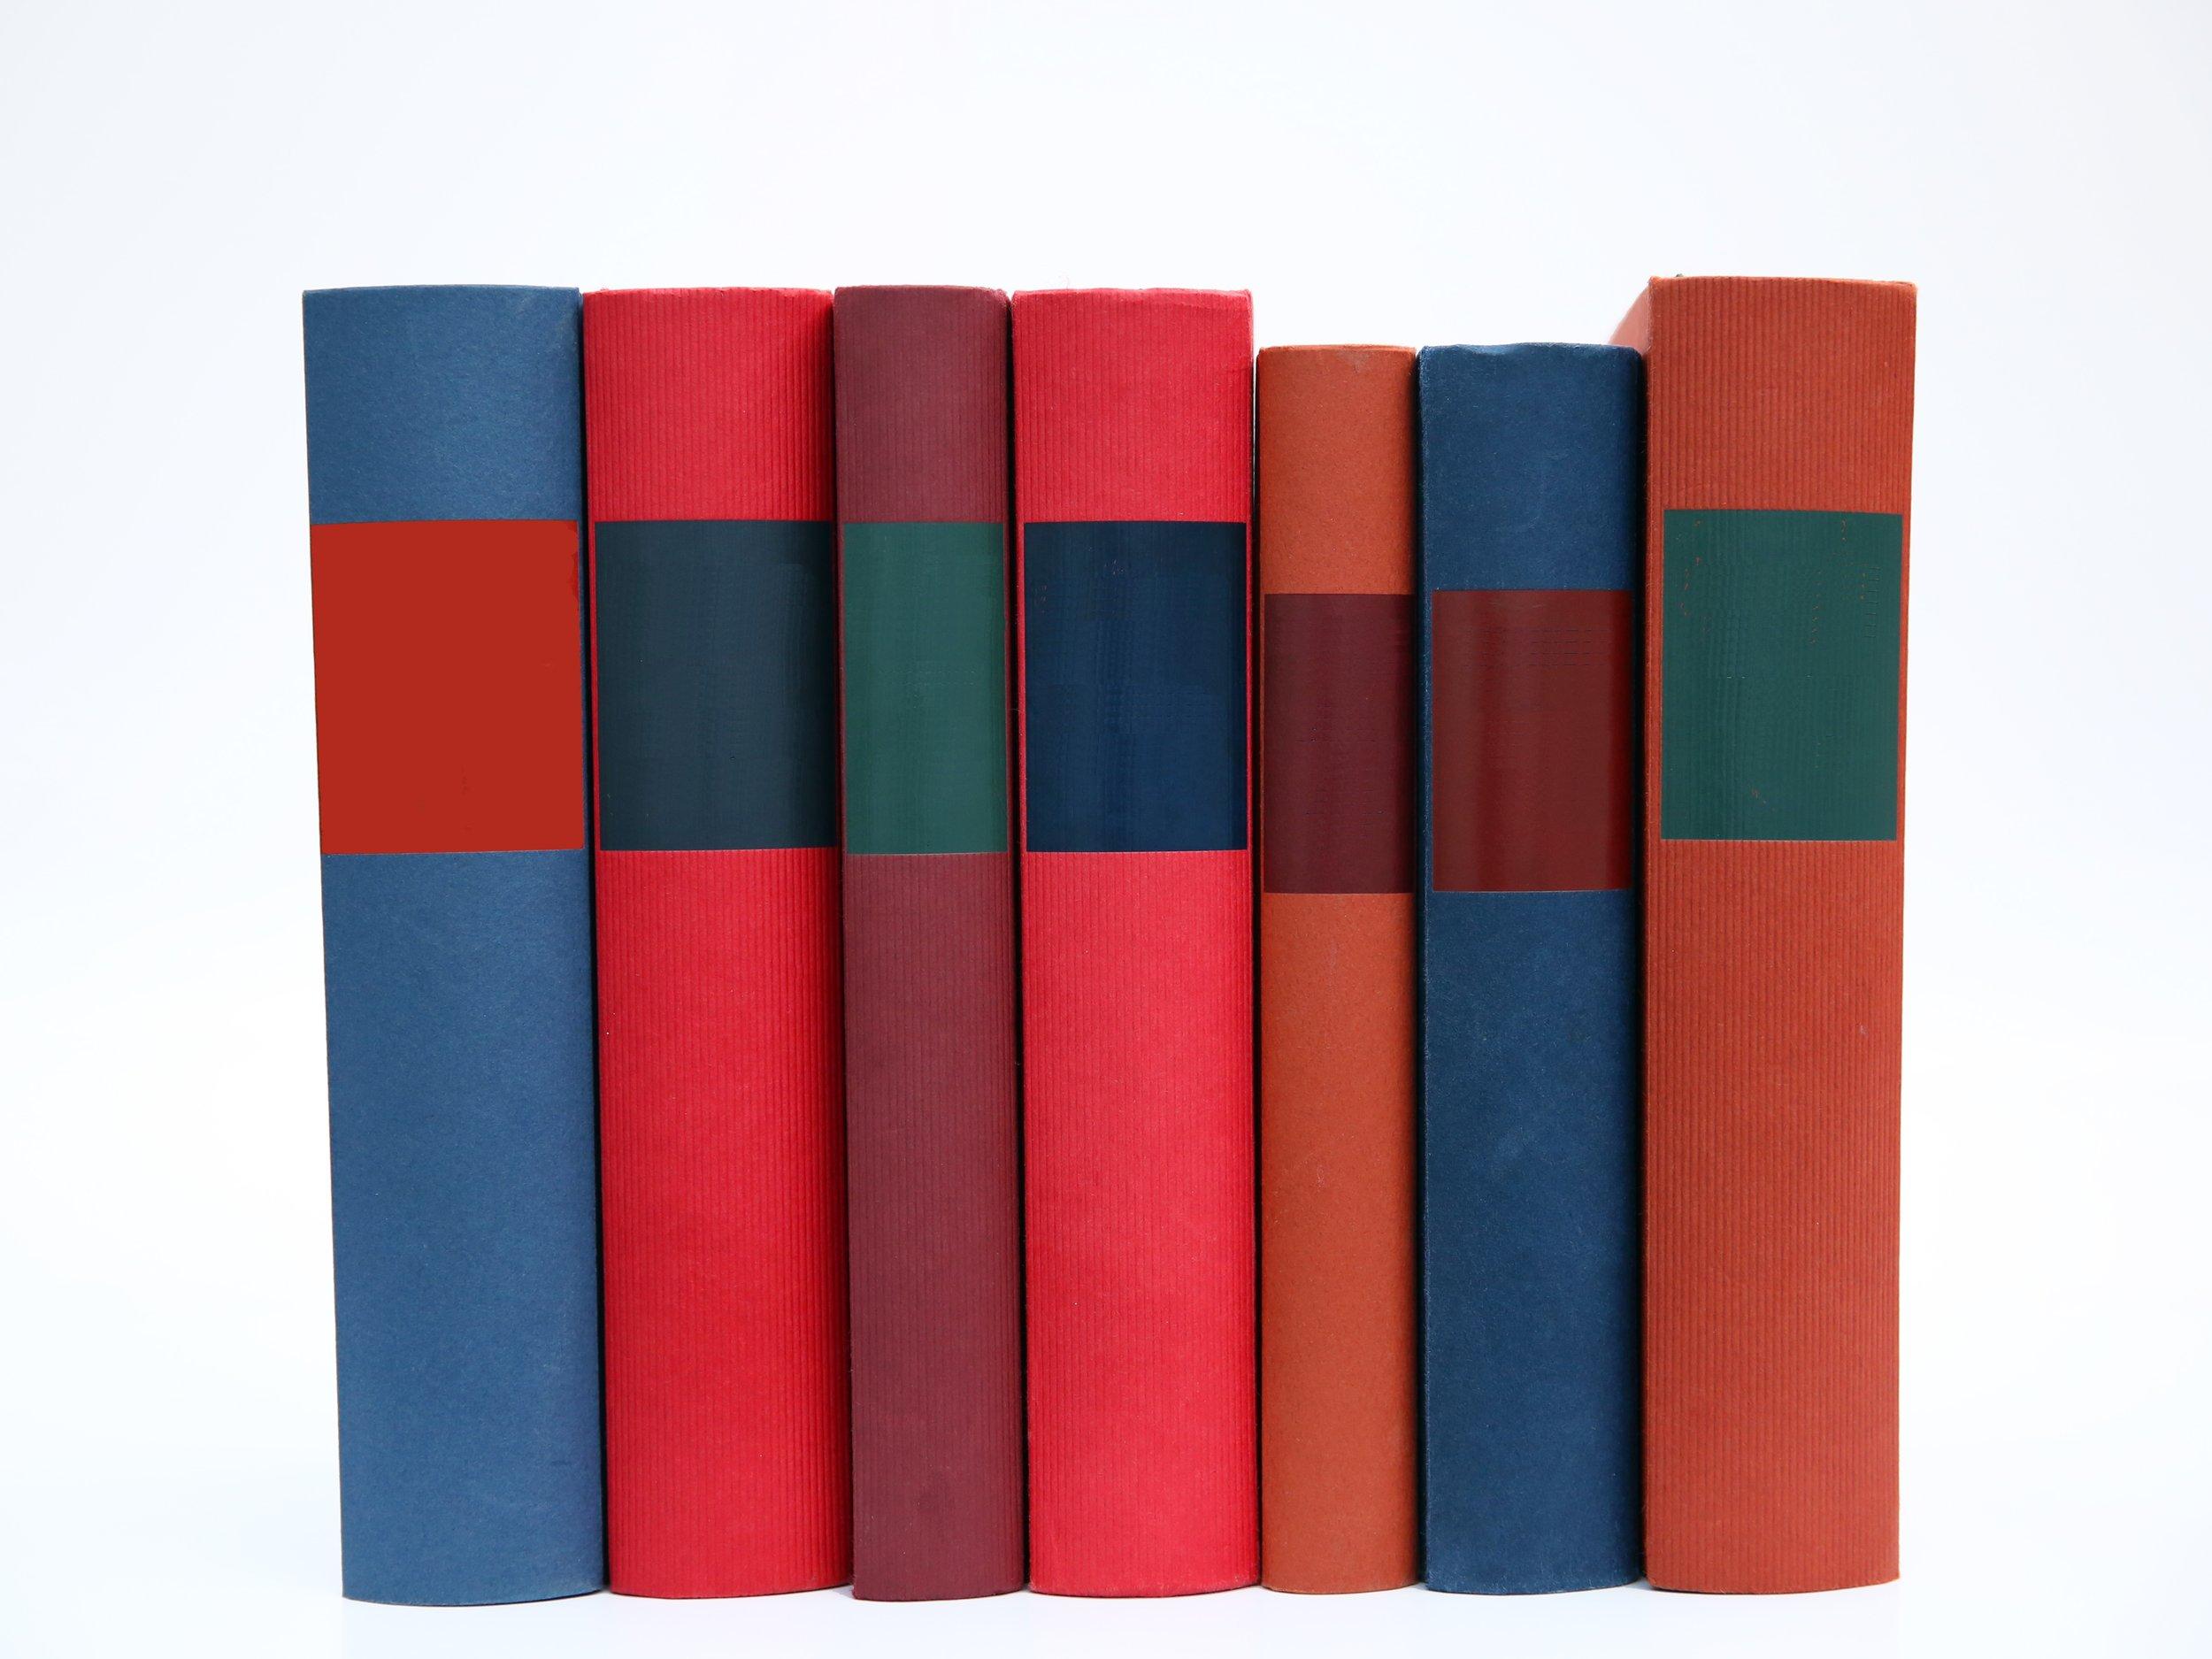 books-education-school-literature-48020-1.jpg